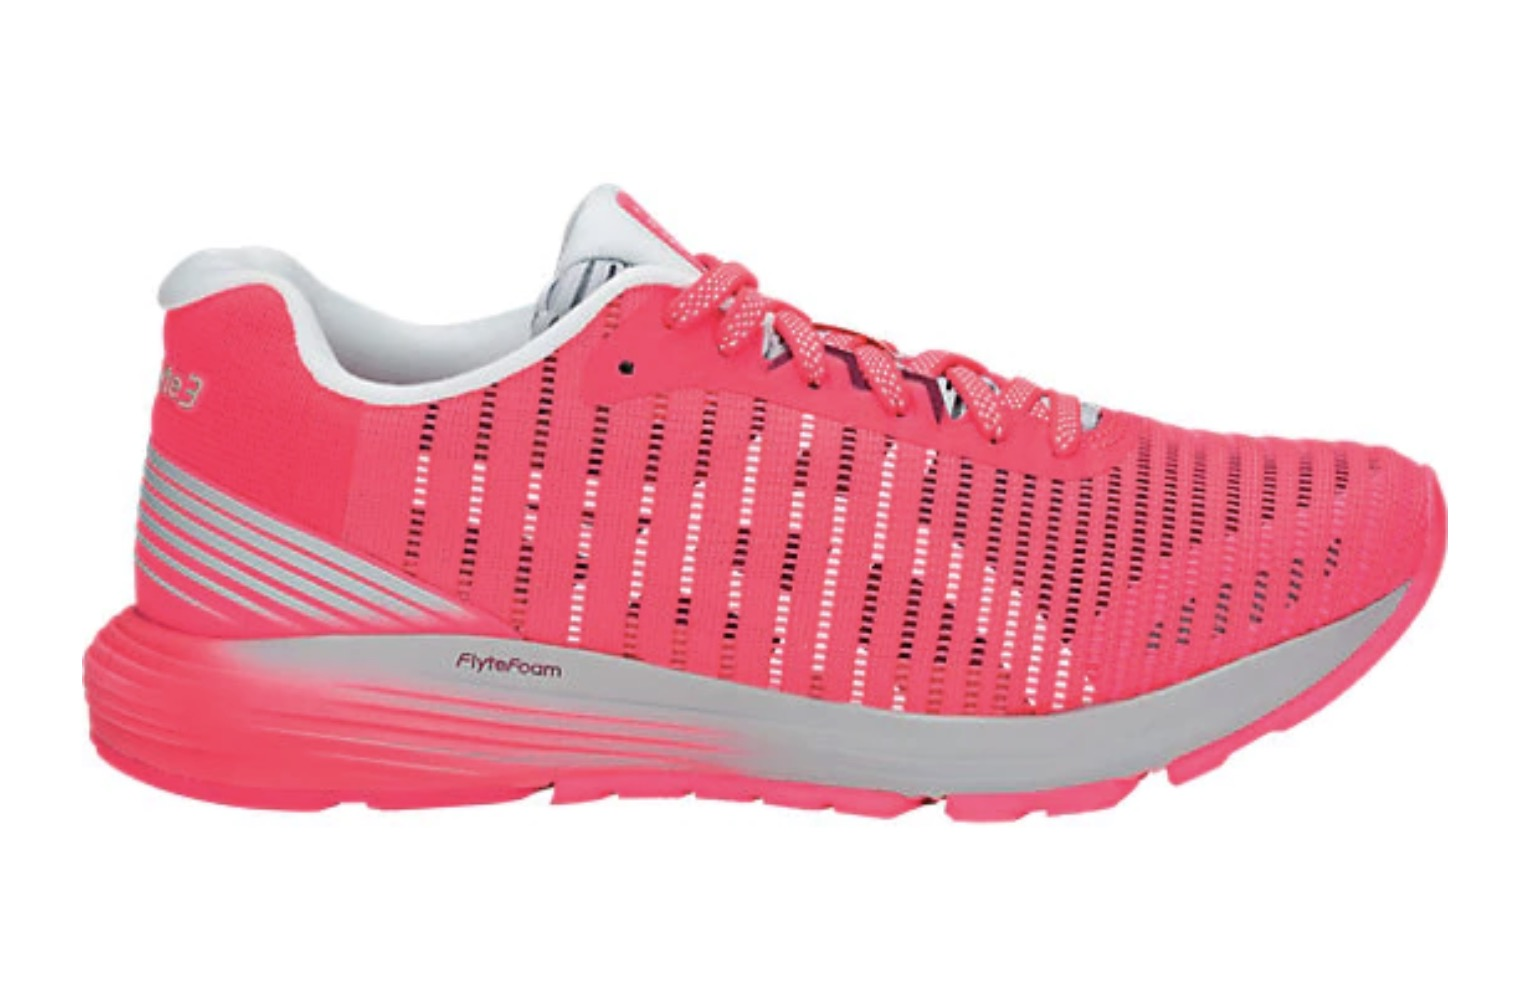 best asics running shoes - dynaflyte 3